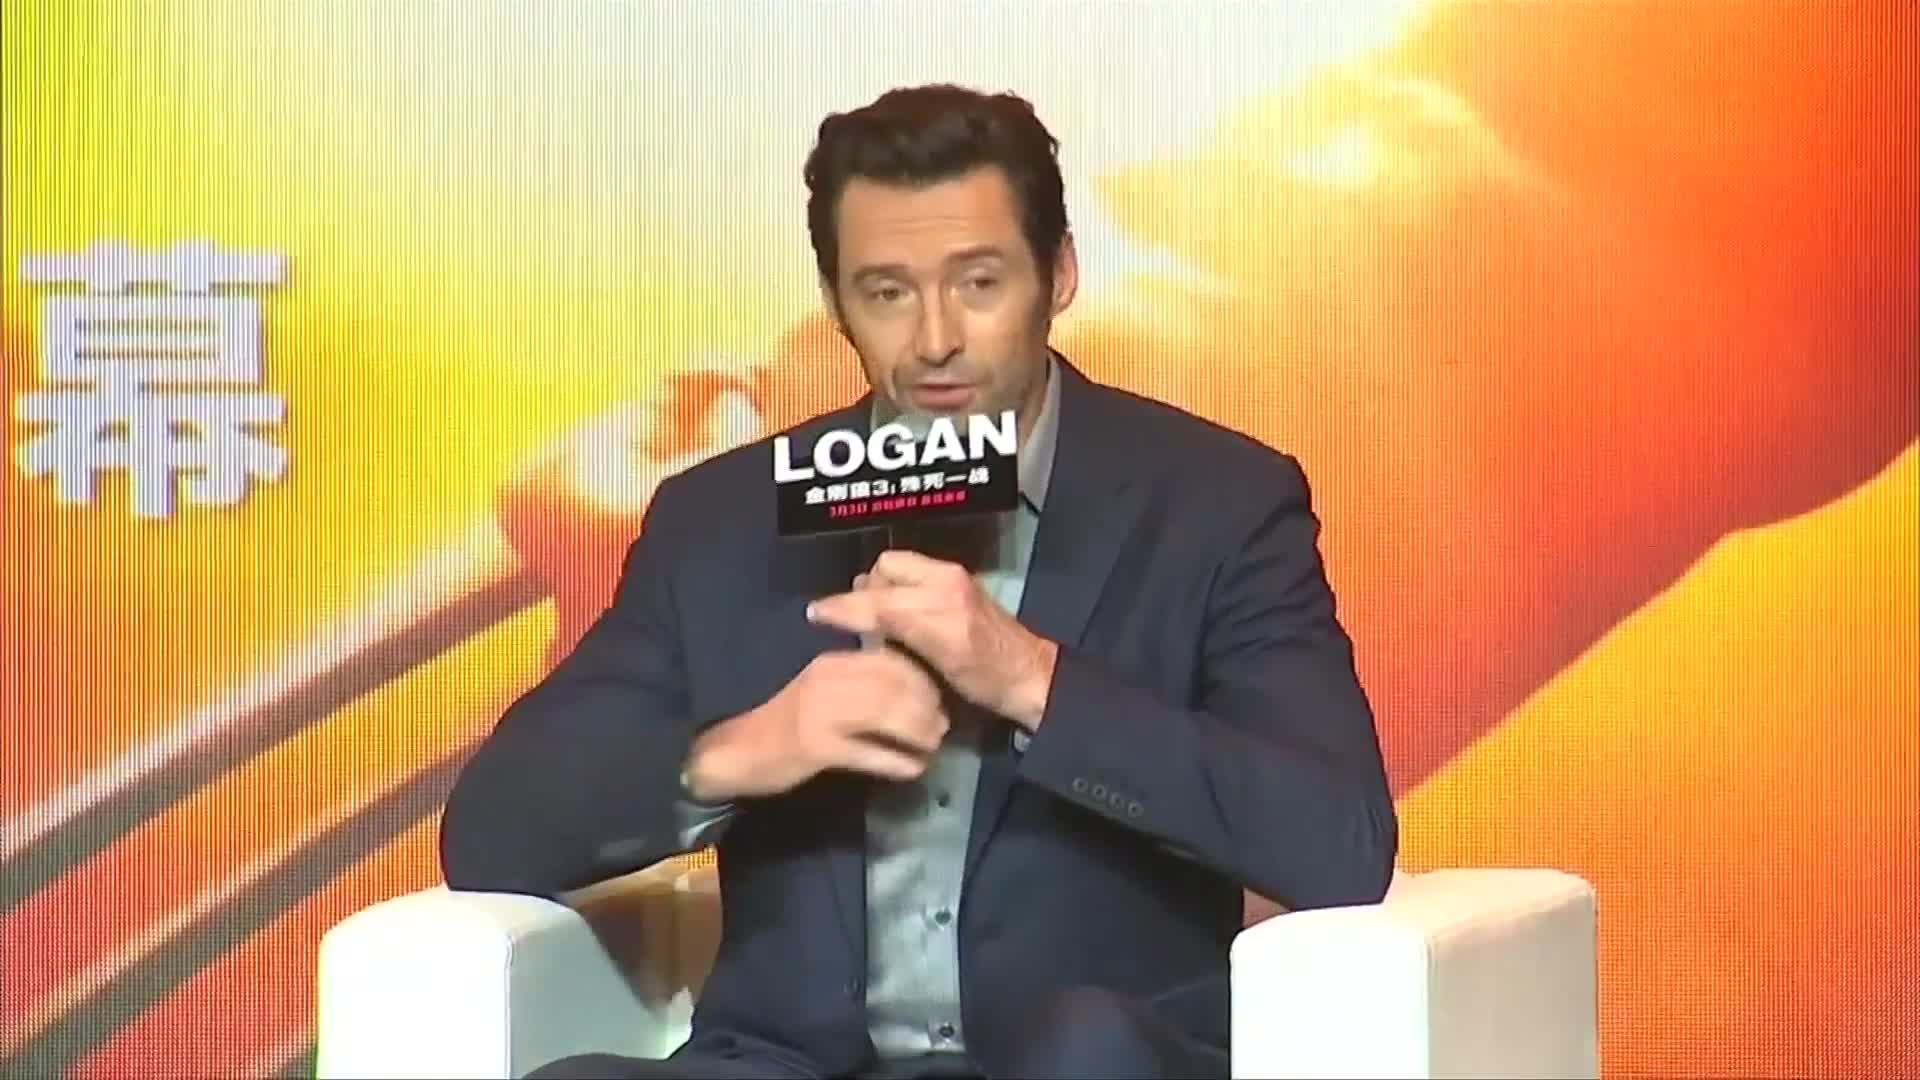 Hugh Jackman promotes Logan in Beijing